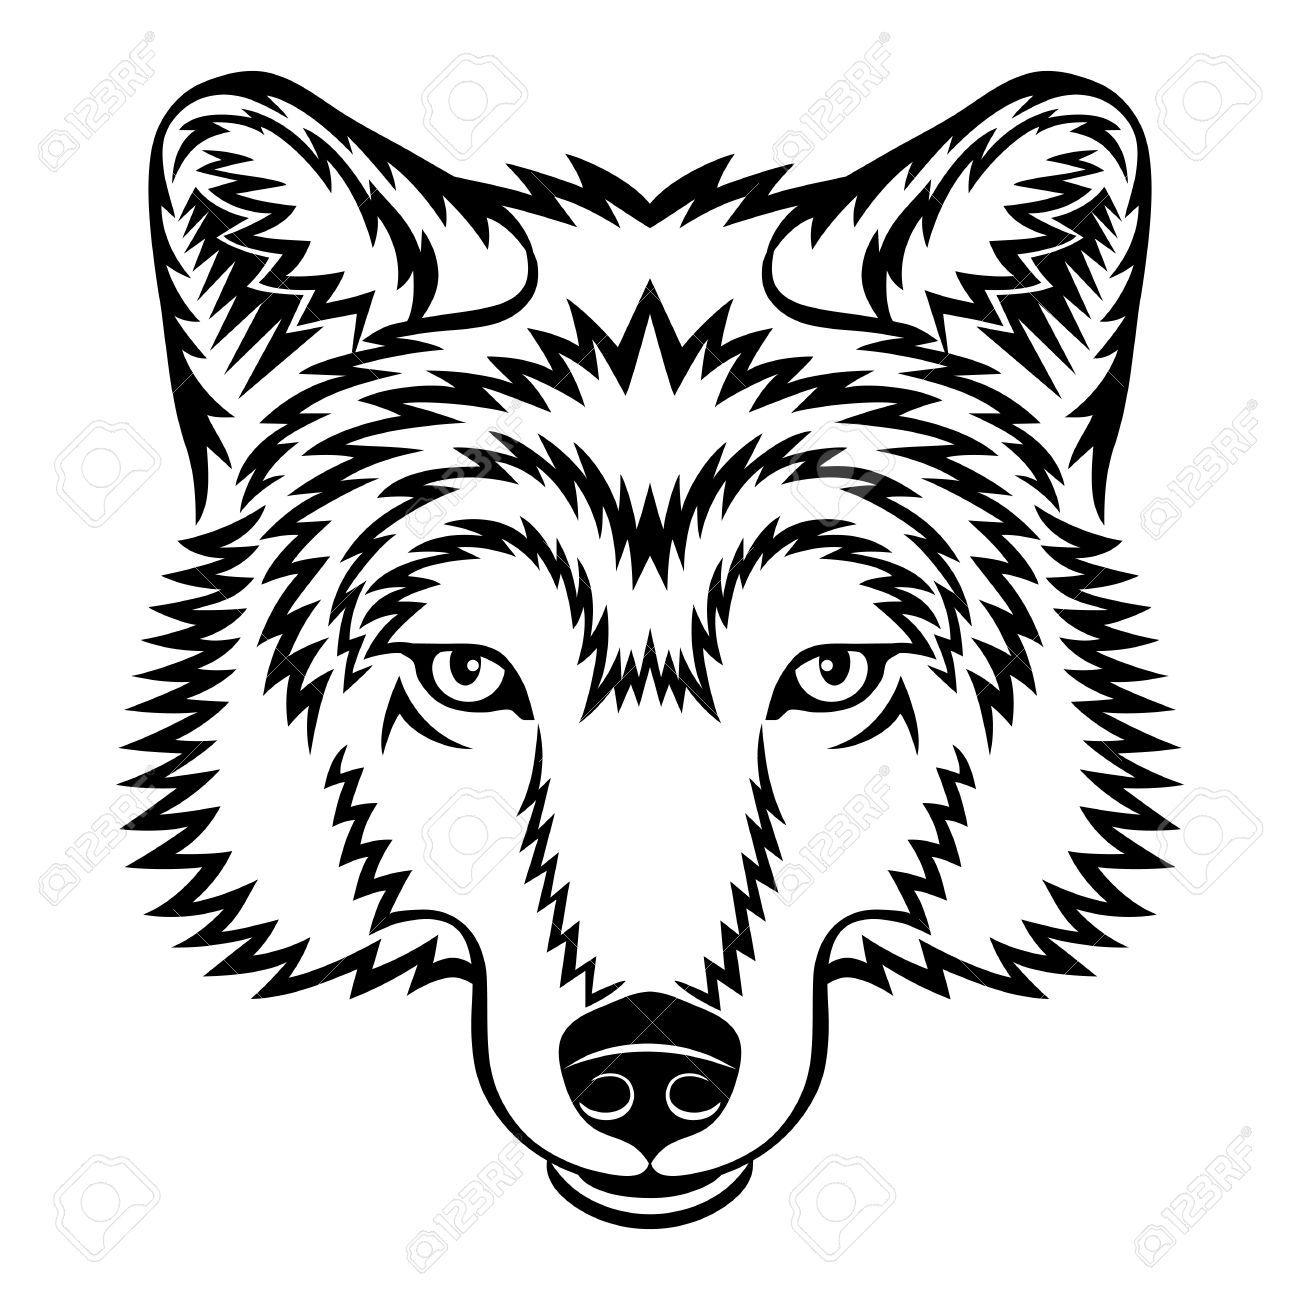 Wolves face clipart